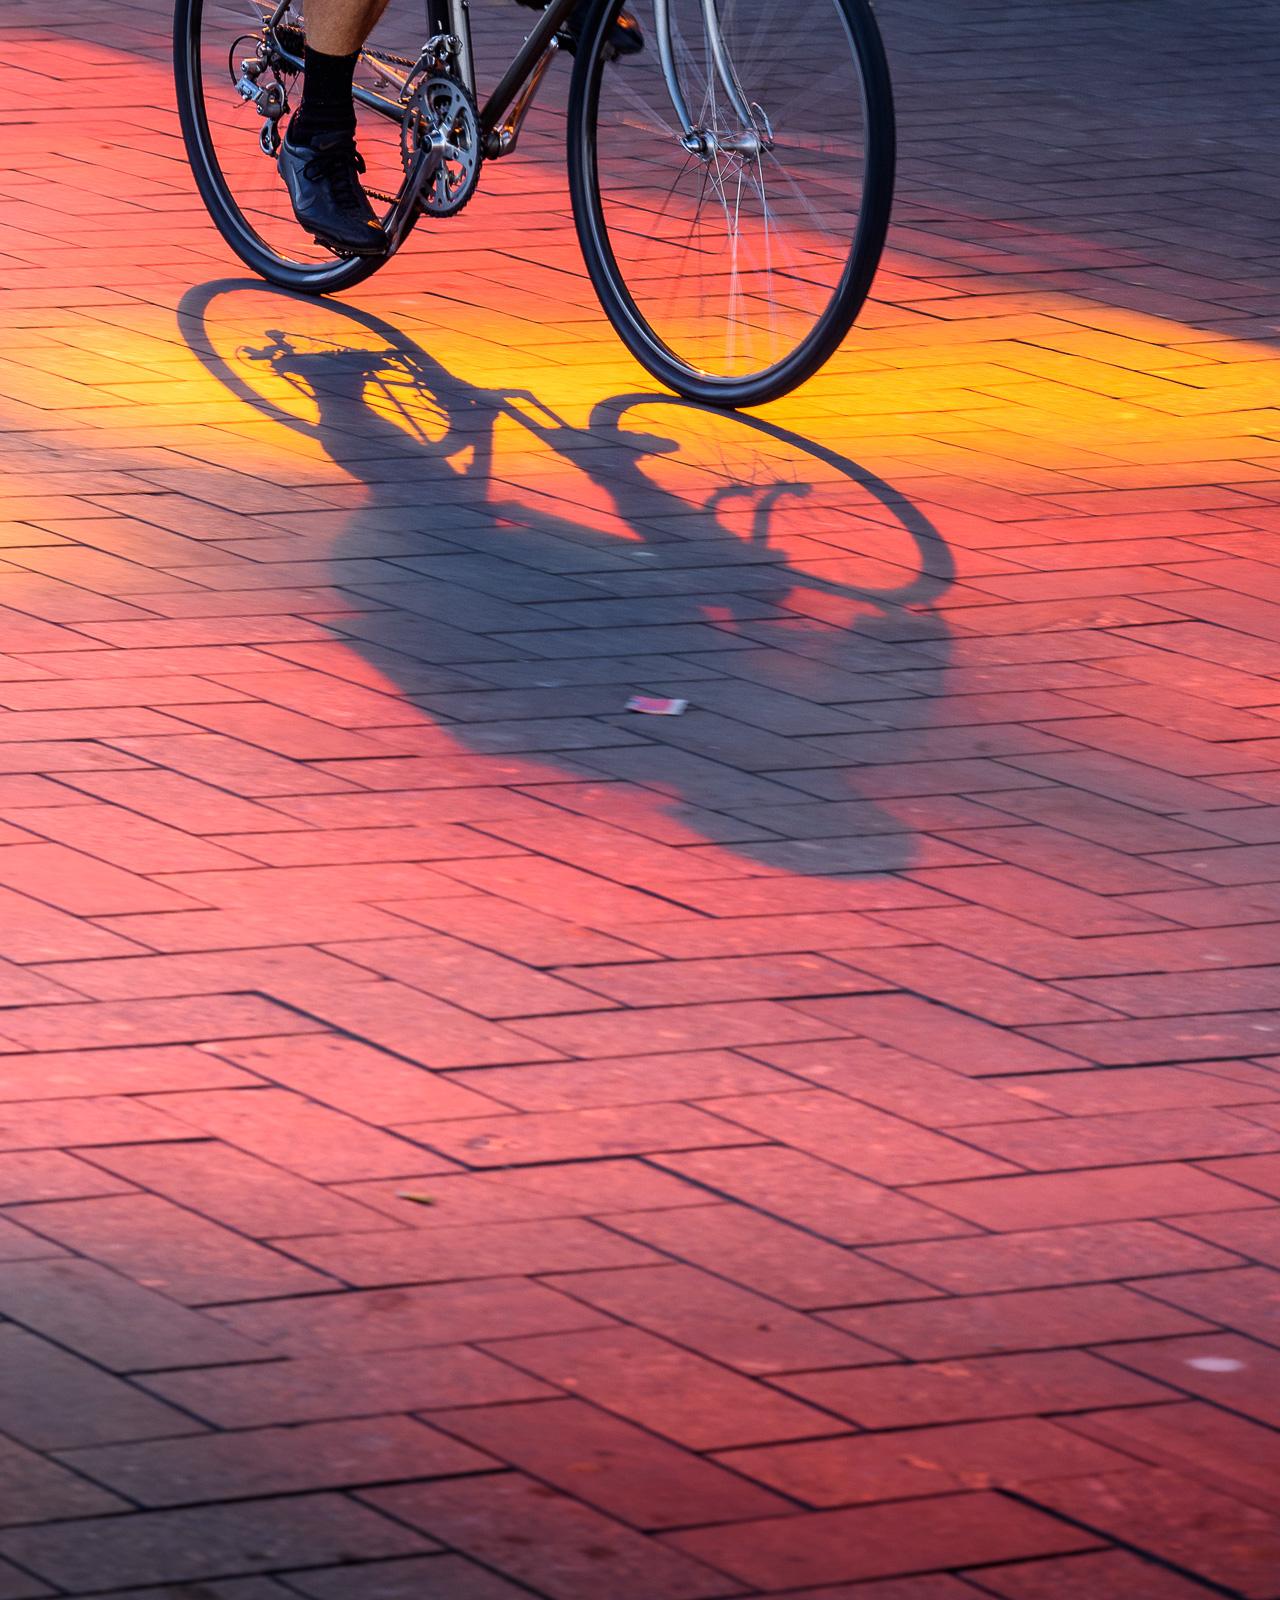 By Amsterdam Centraal. Nikon D810, 24-120 f/4 AF-S VR